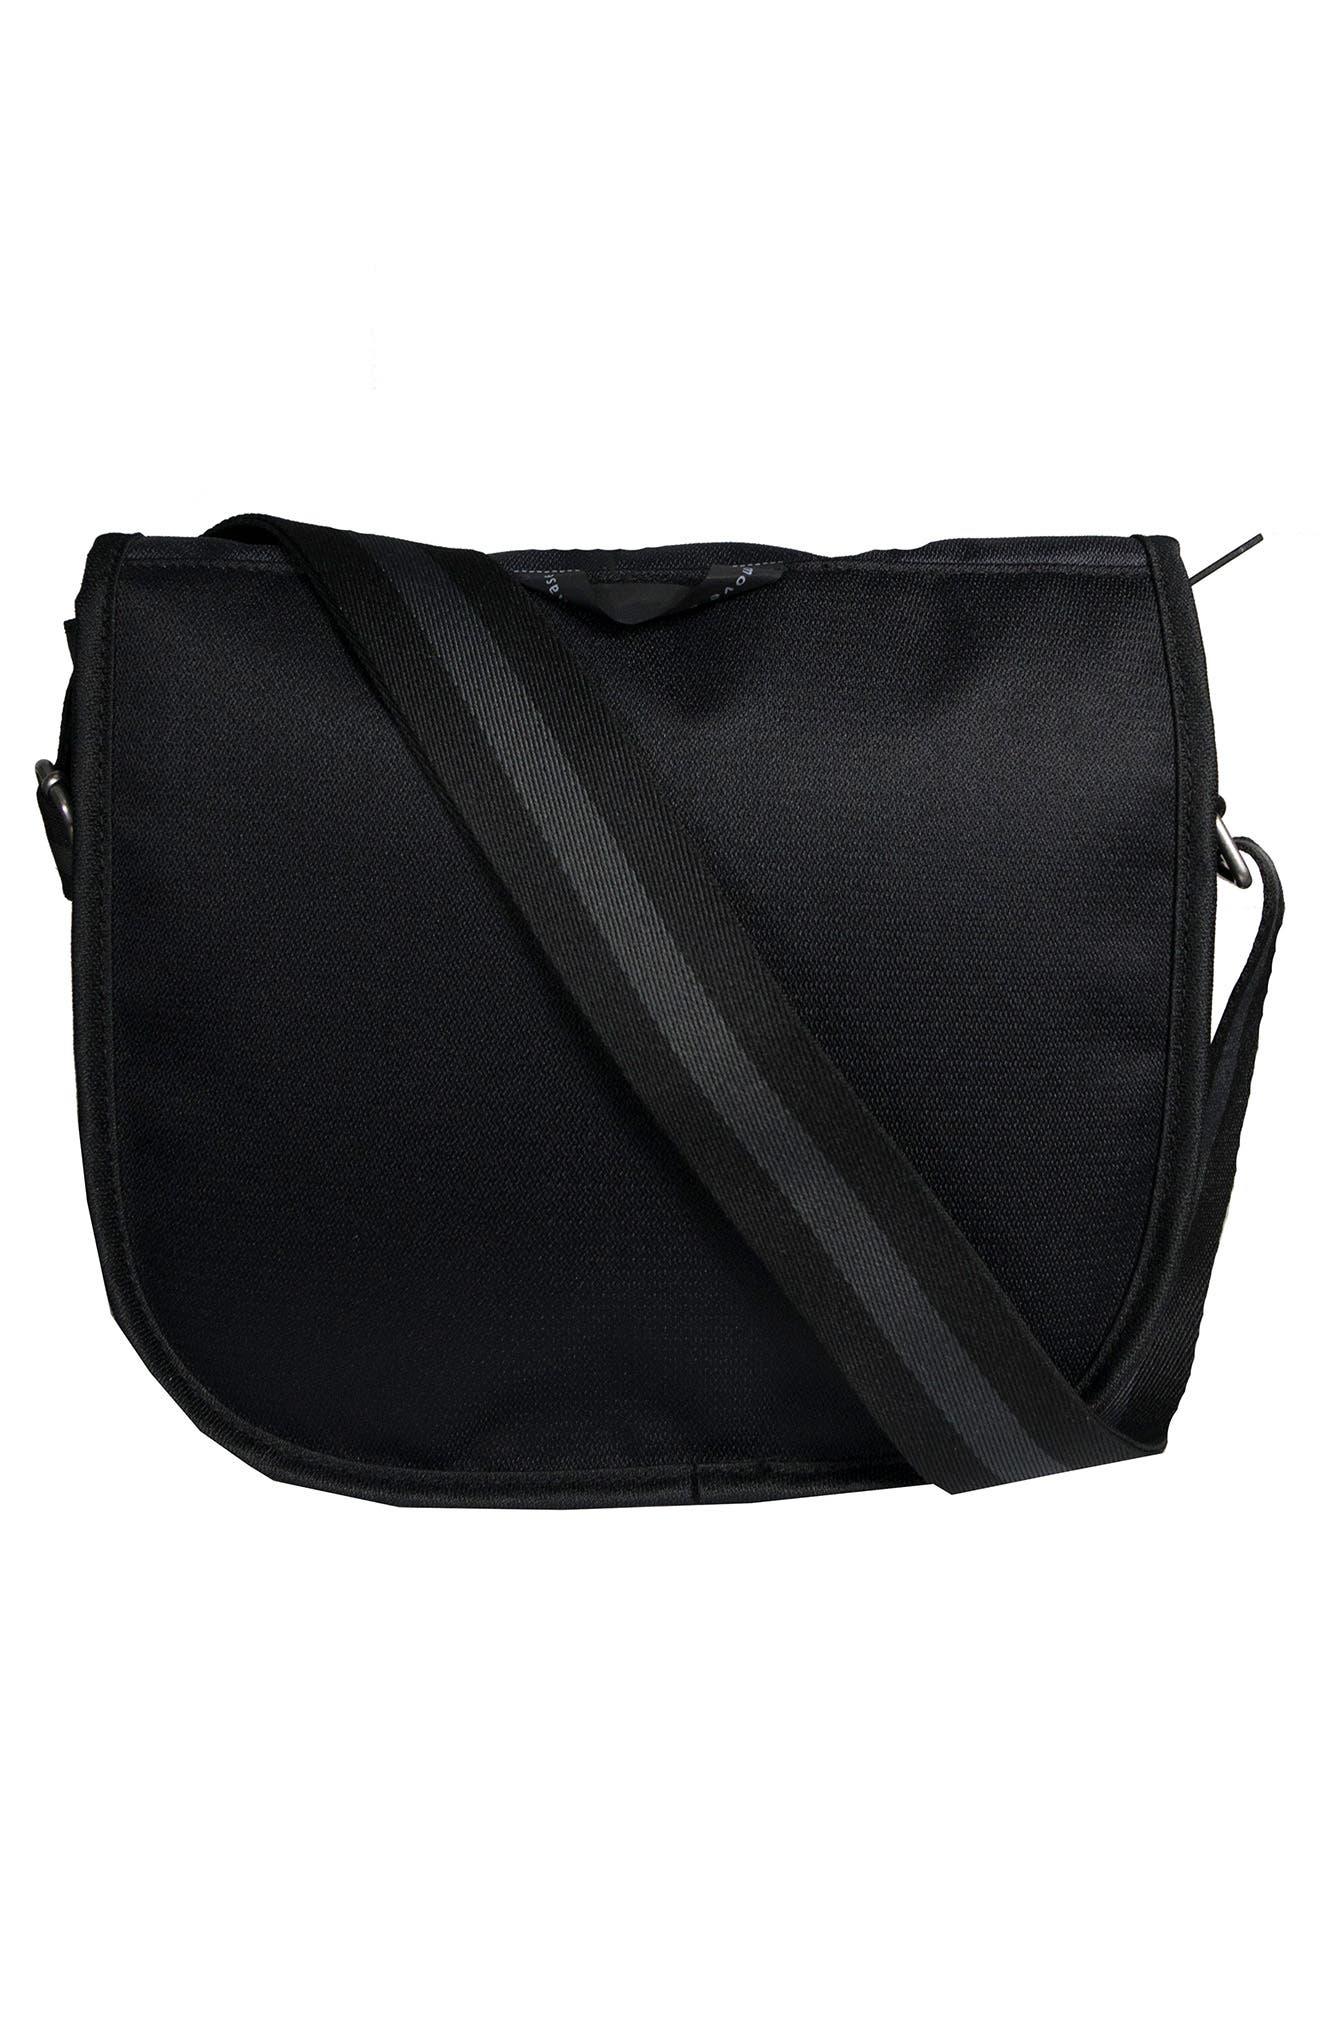 Alternate Image 2  - Sherpani Milli Water Resistant RFID Pocket Messenger Bag